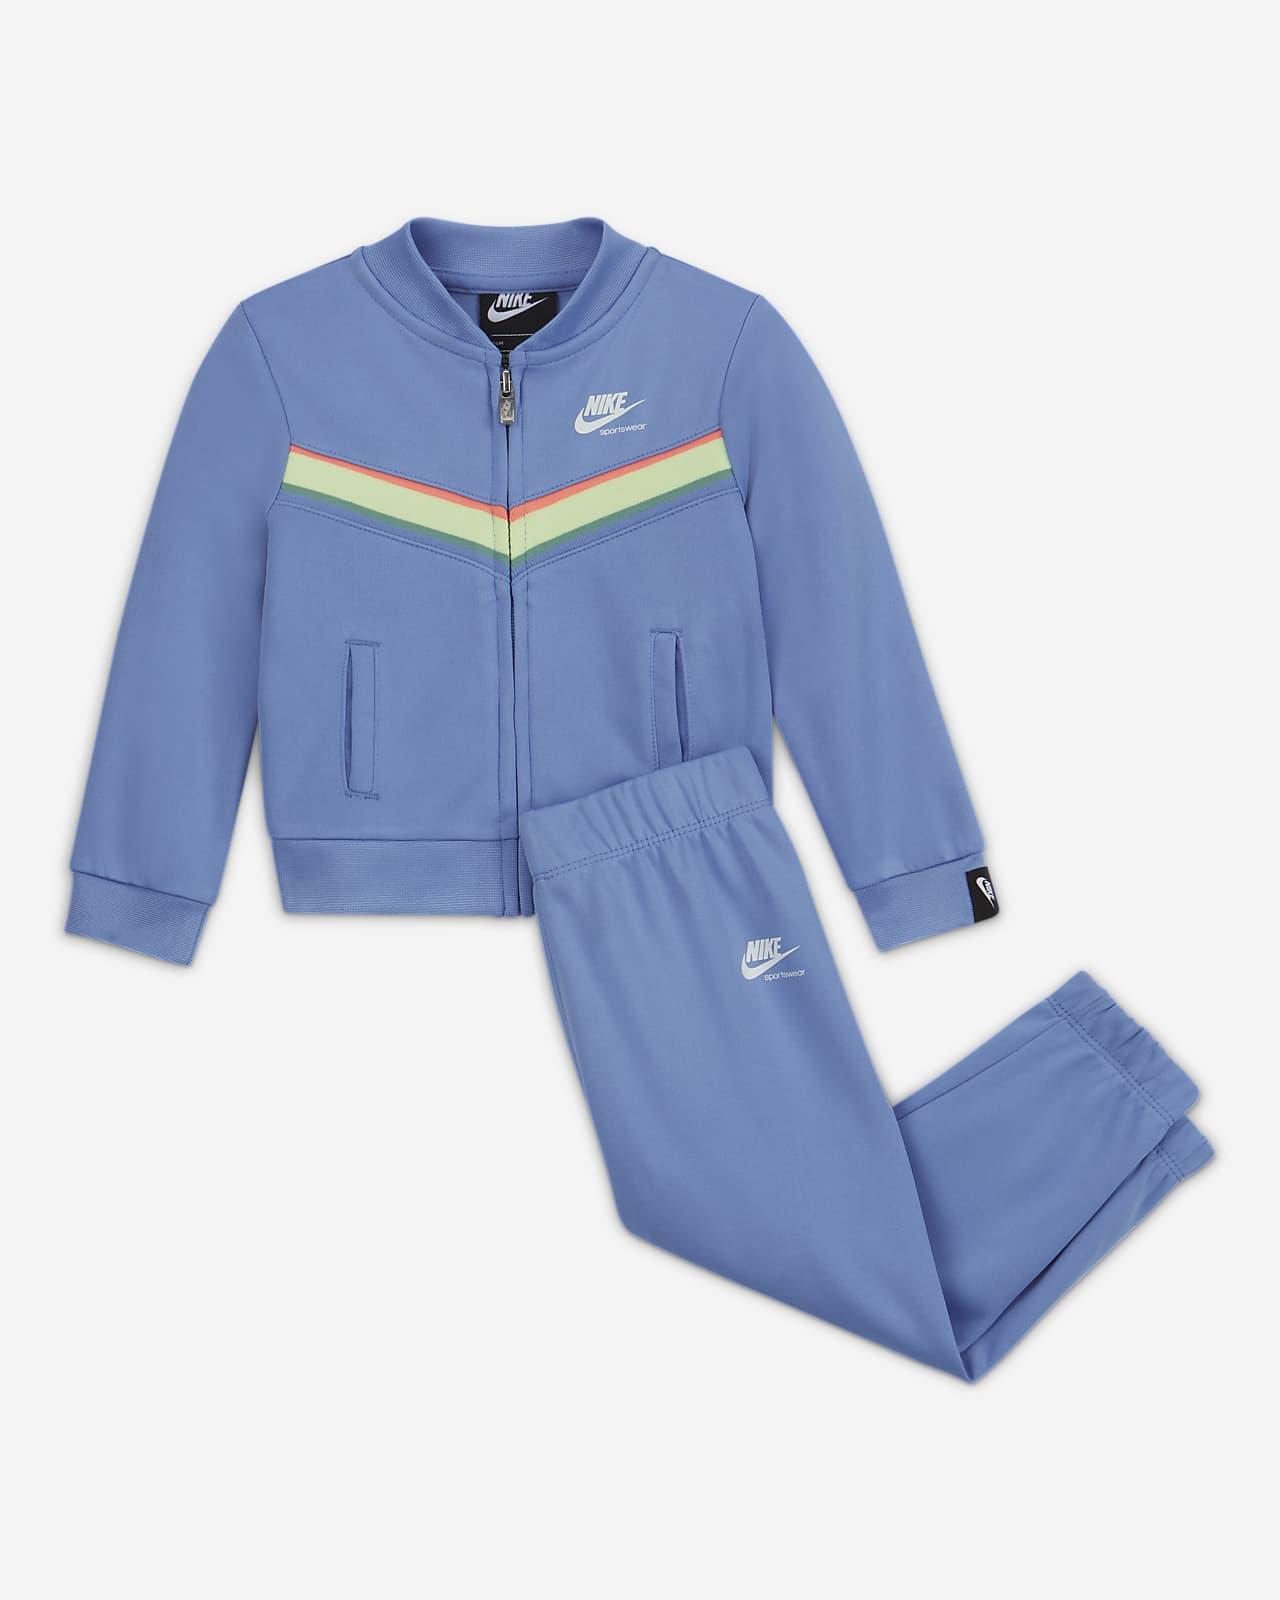 Nike Baby (12-24M) Jacket and Pants Set